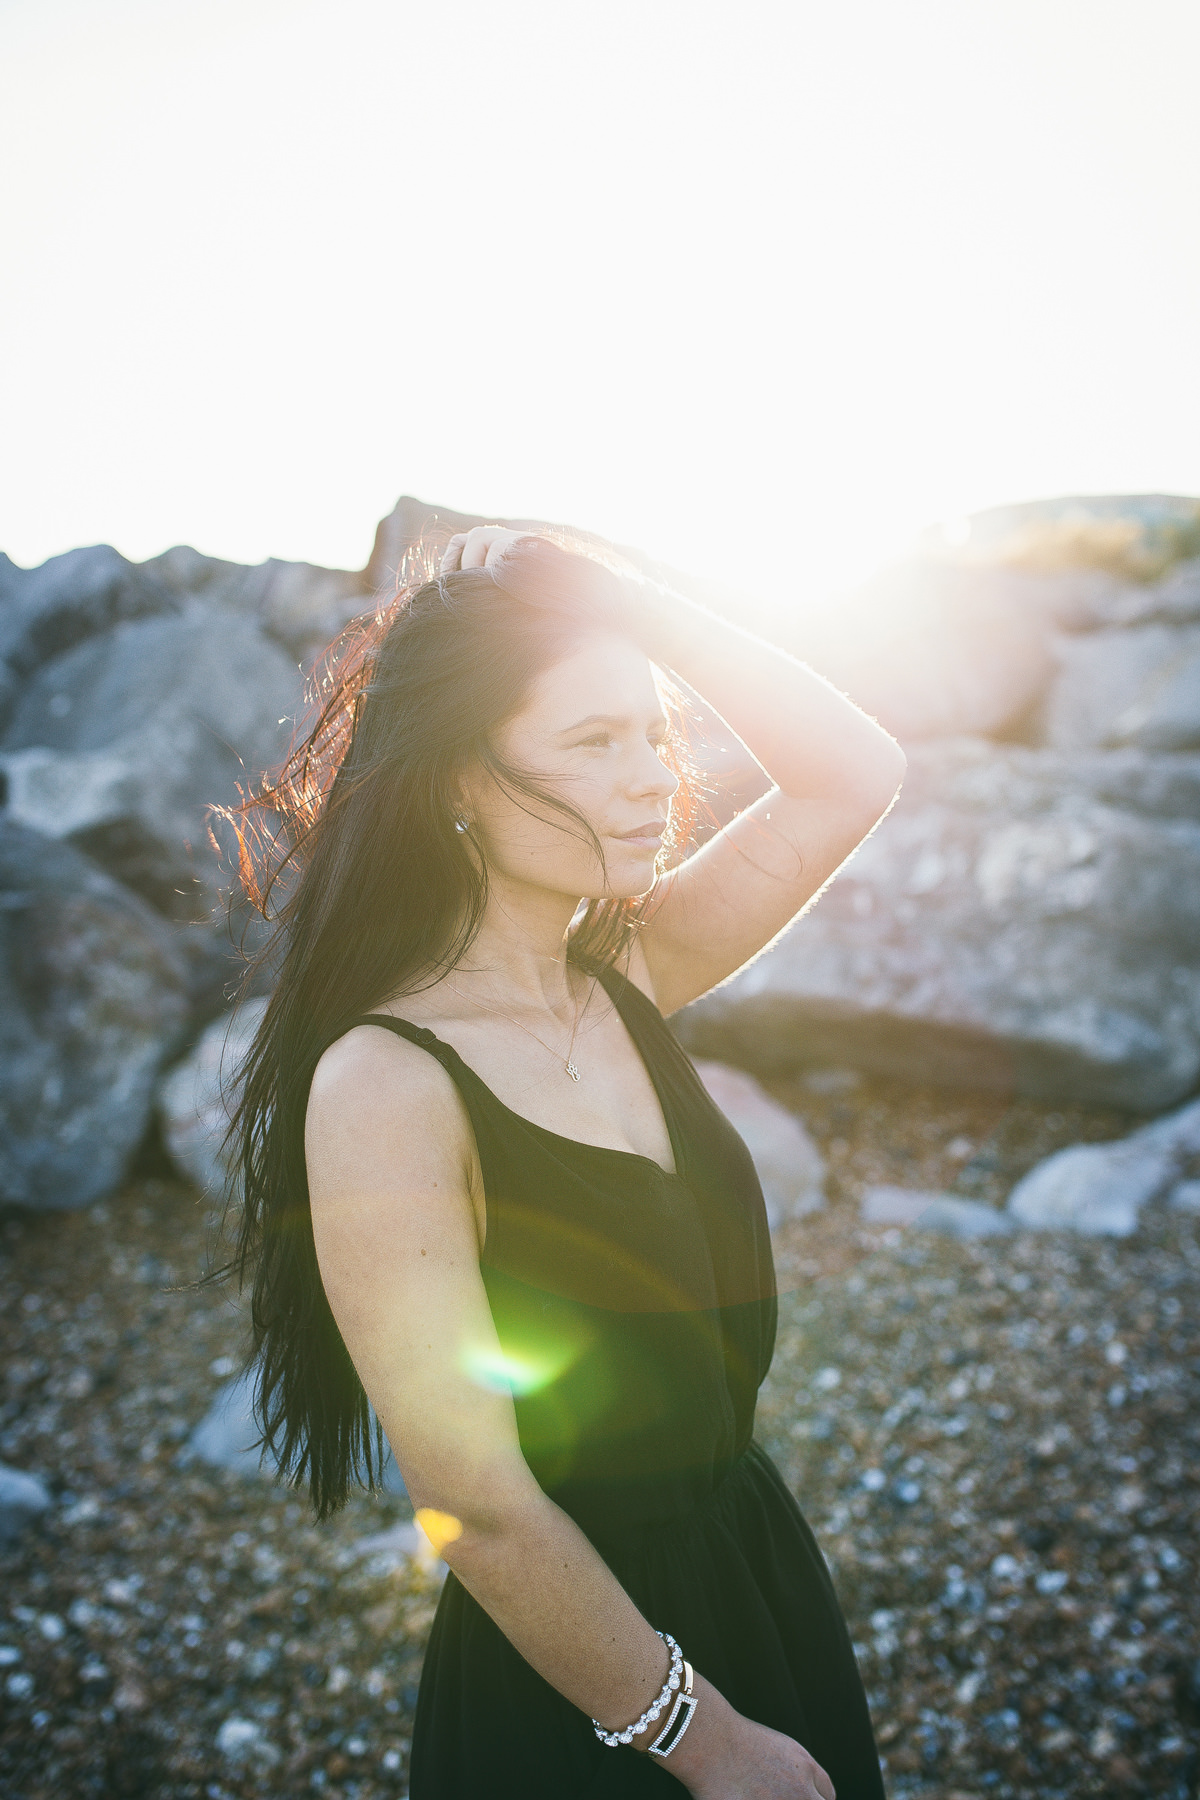 Sabina-Worthing-Beach-Sussex-Portrait-Photographer-VILCINSKAITE-PHOTO.jpg